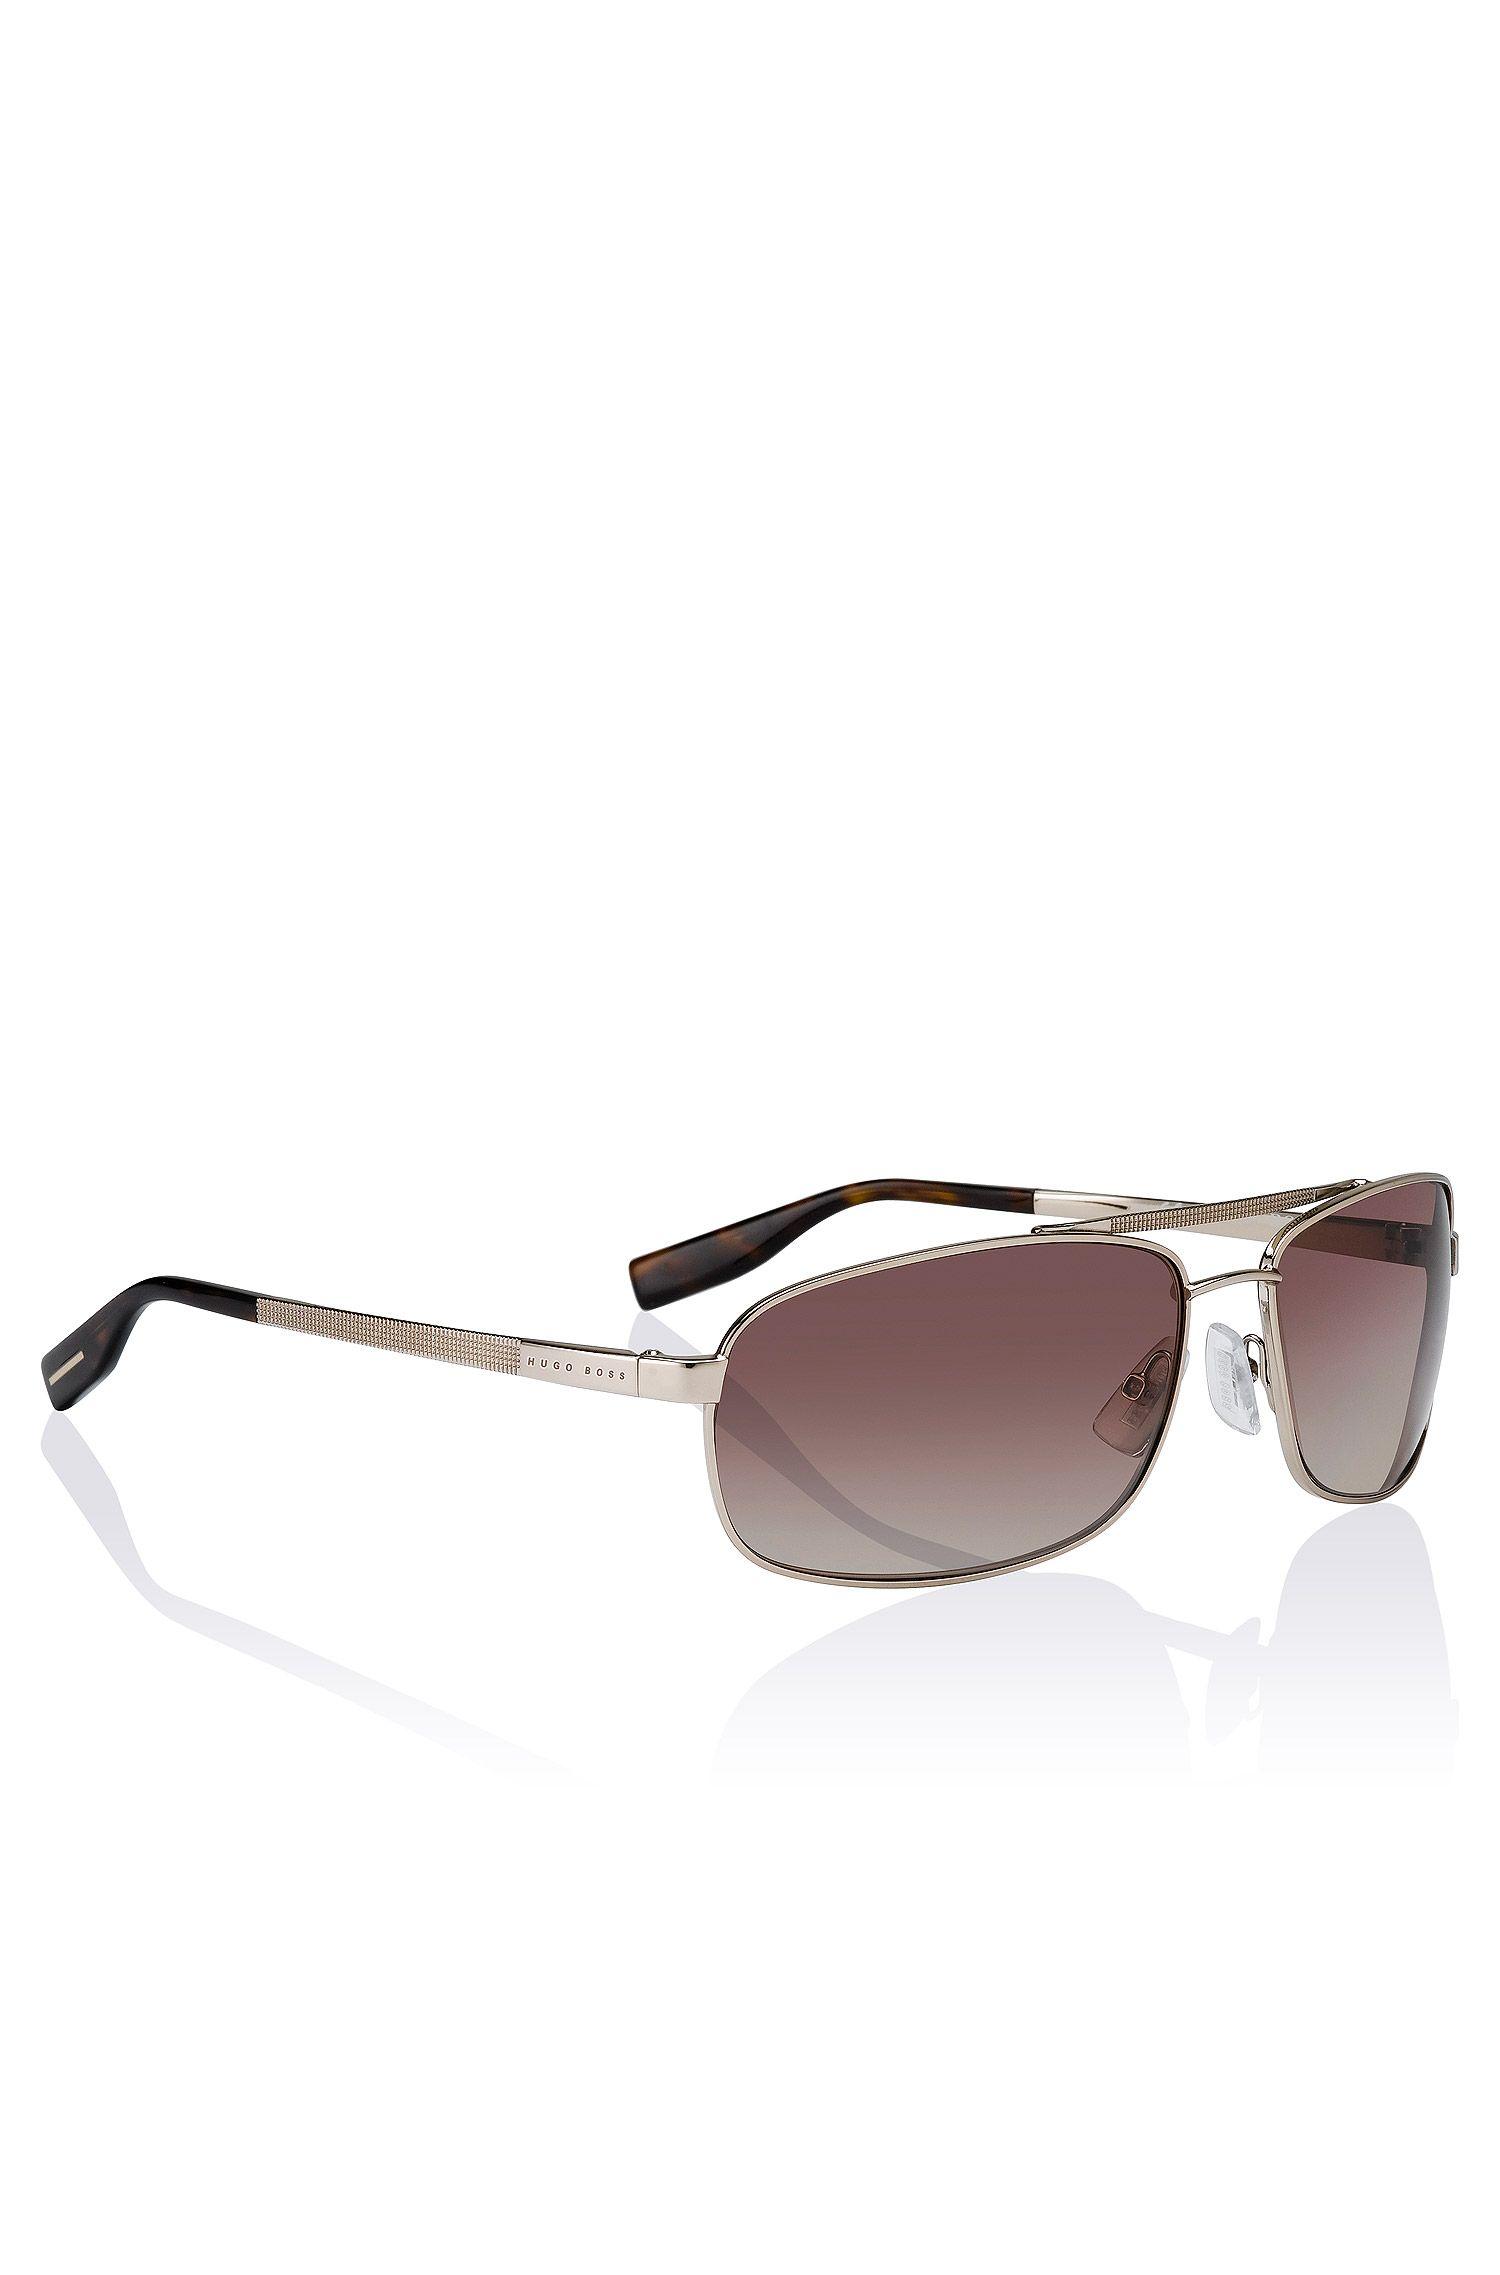 Sonnenbrille ´BOSS 0514/S`